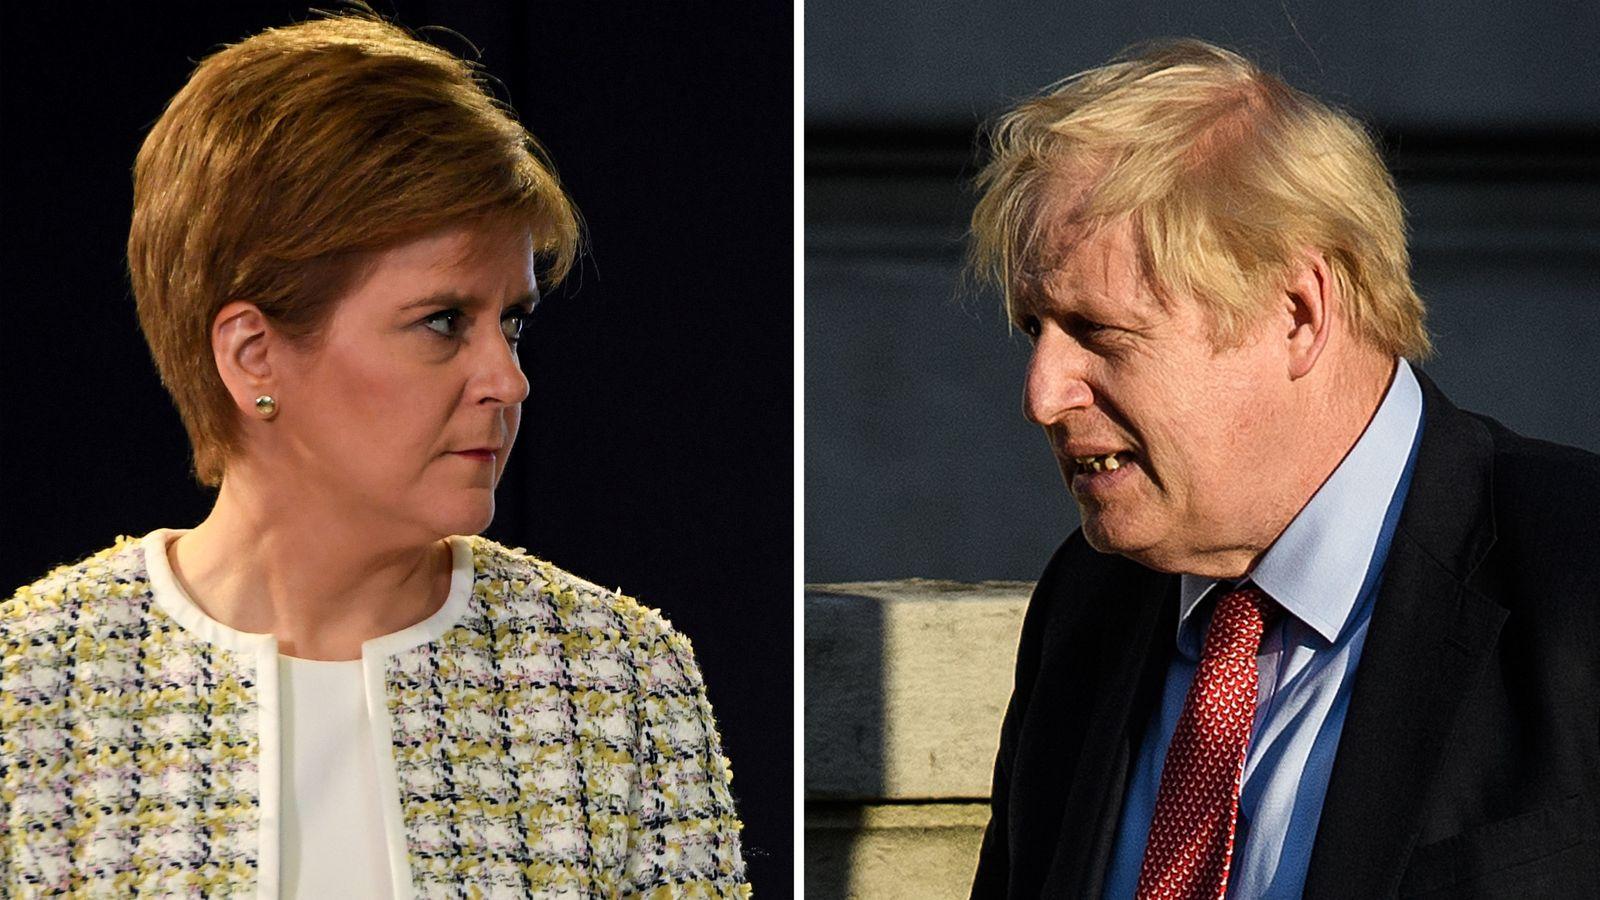 Scottish independence referendum: Nicola Sturgeon tells Boris Johnson new vote is 'when, not if'